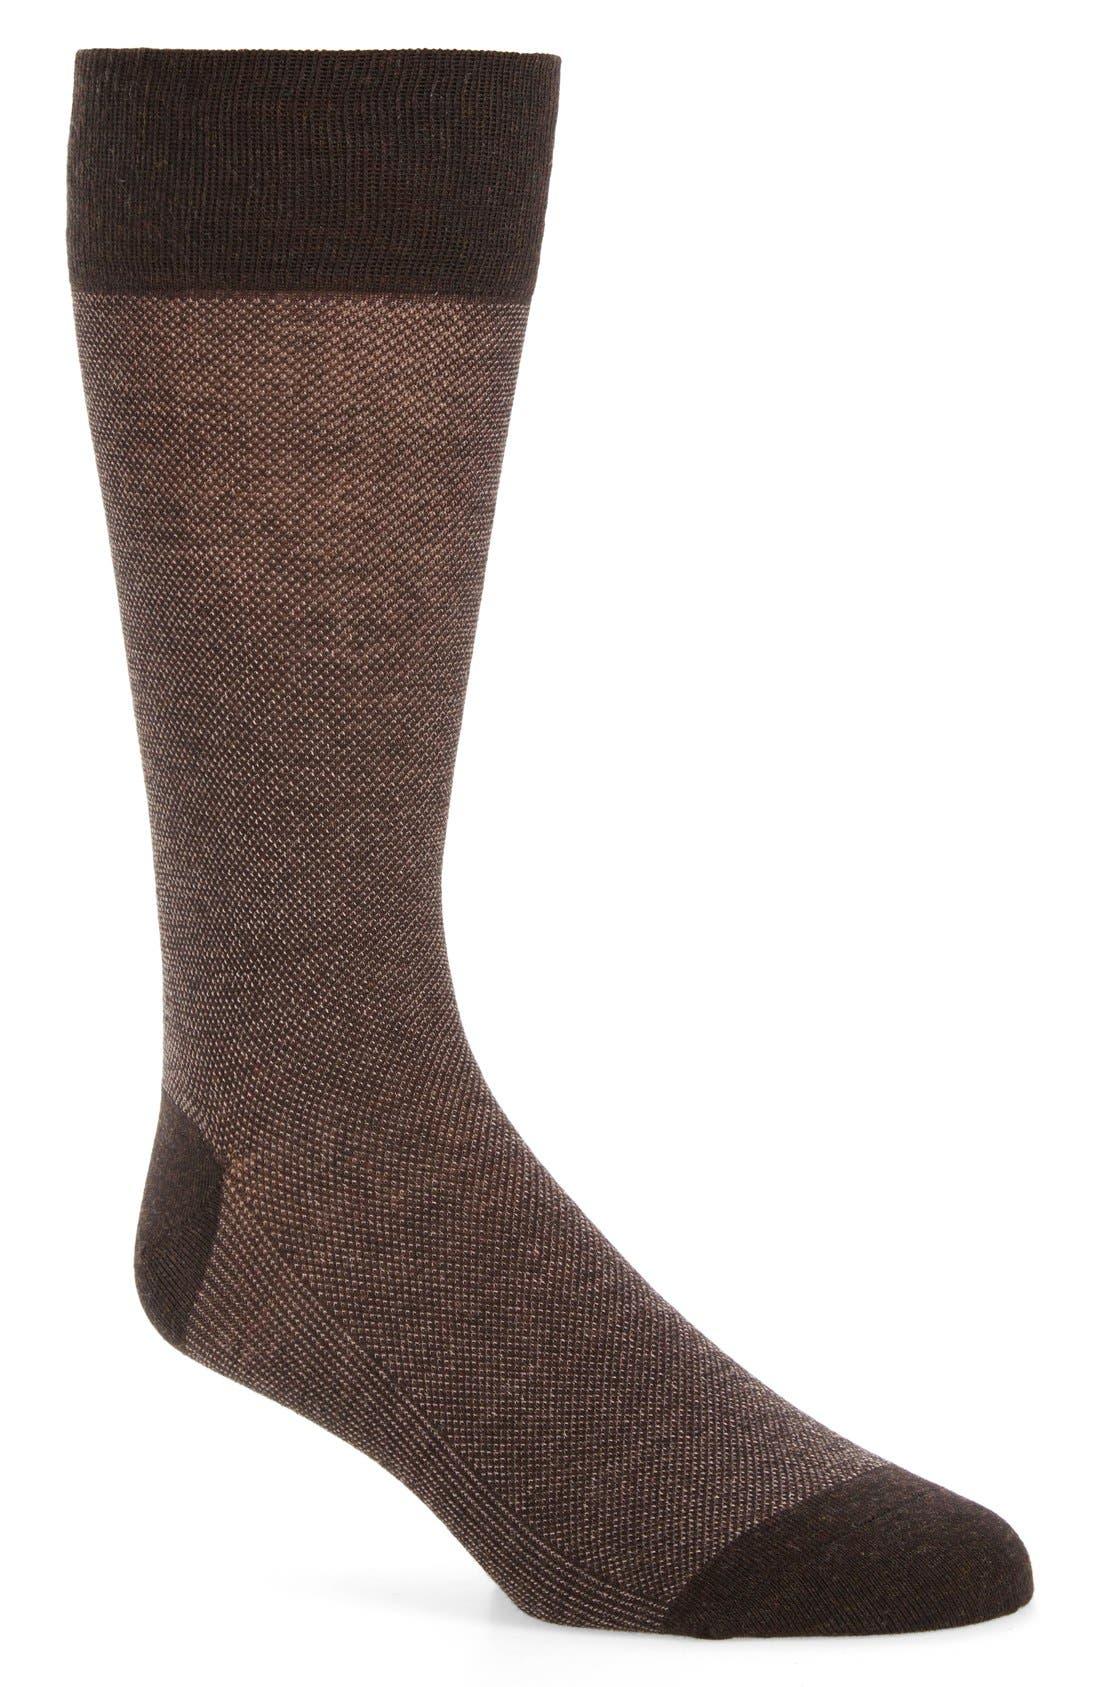 Piqué Texture Crew Socks,                         Main,                         color, Chestnut Heather